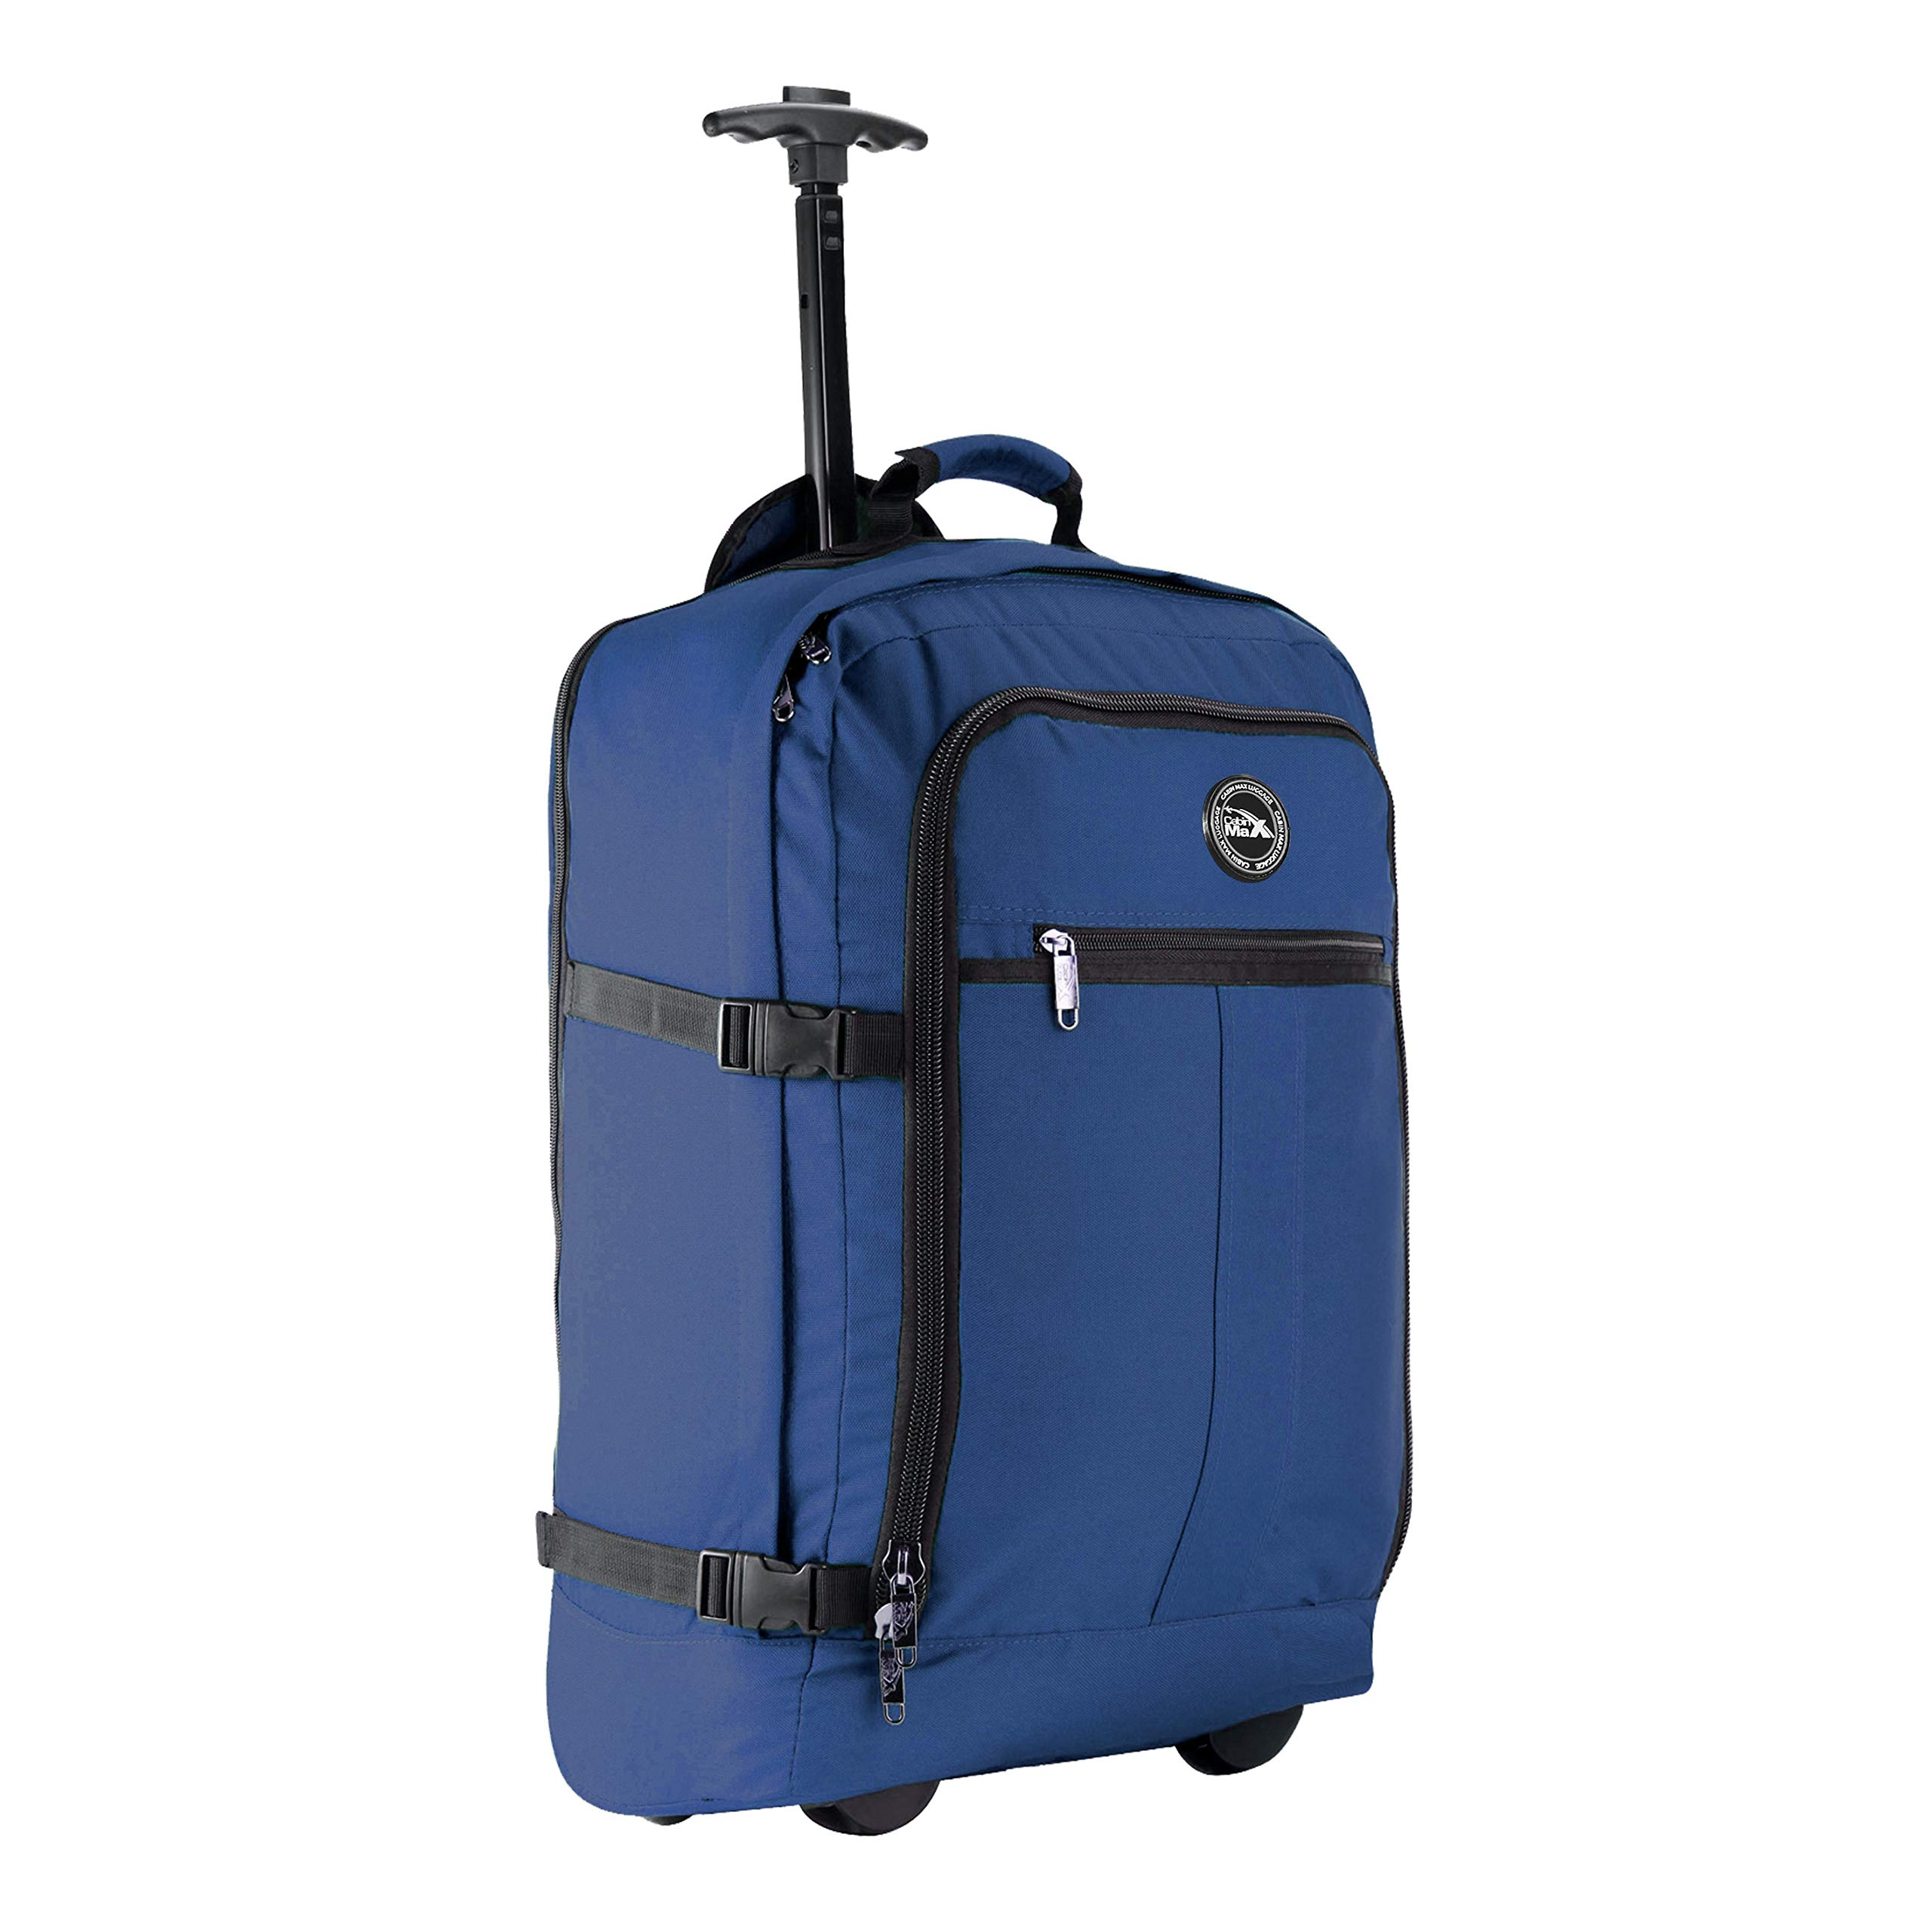 Cabin Max Lyon Flugzugelassenes Handgepäck Rucksack Tasche